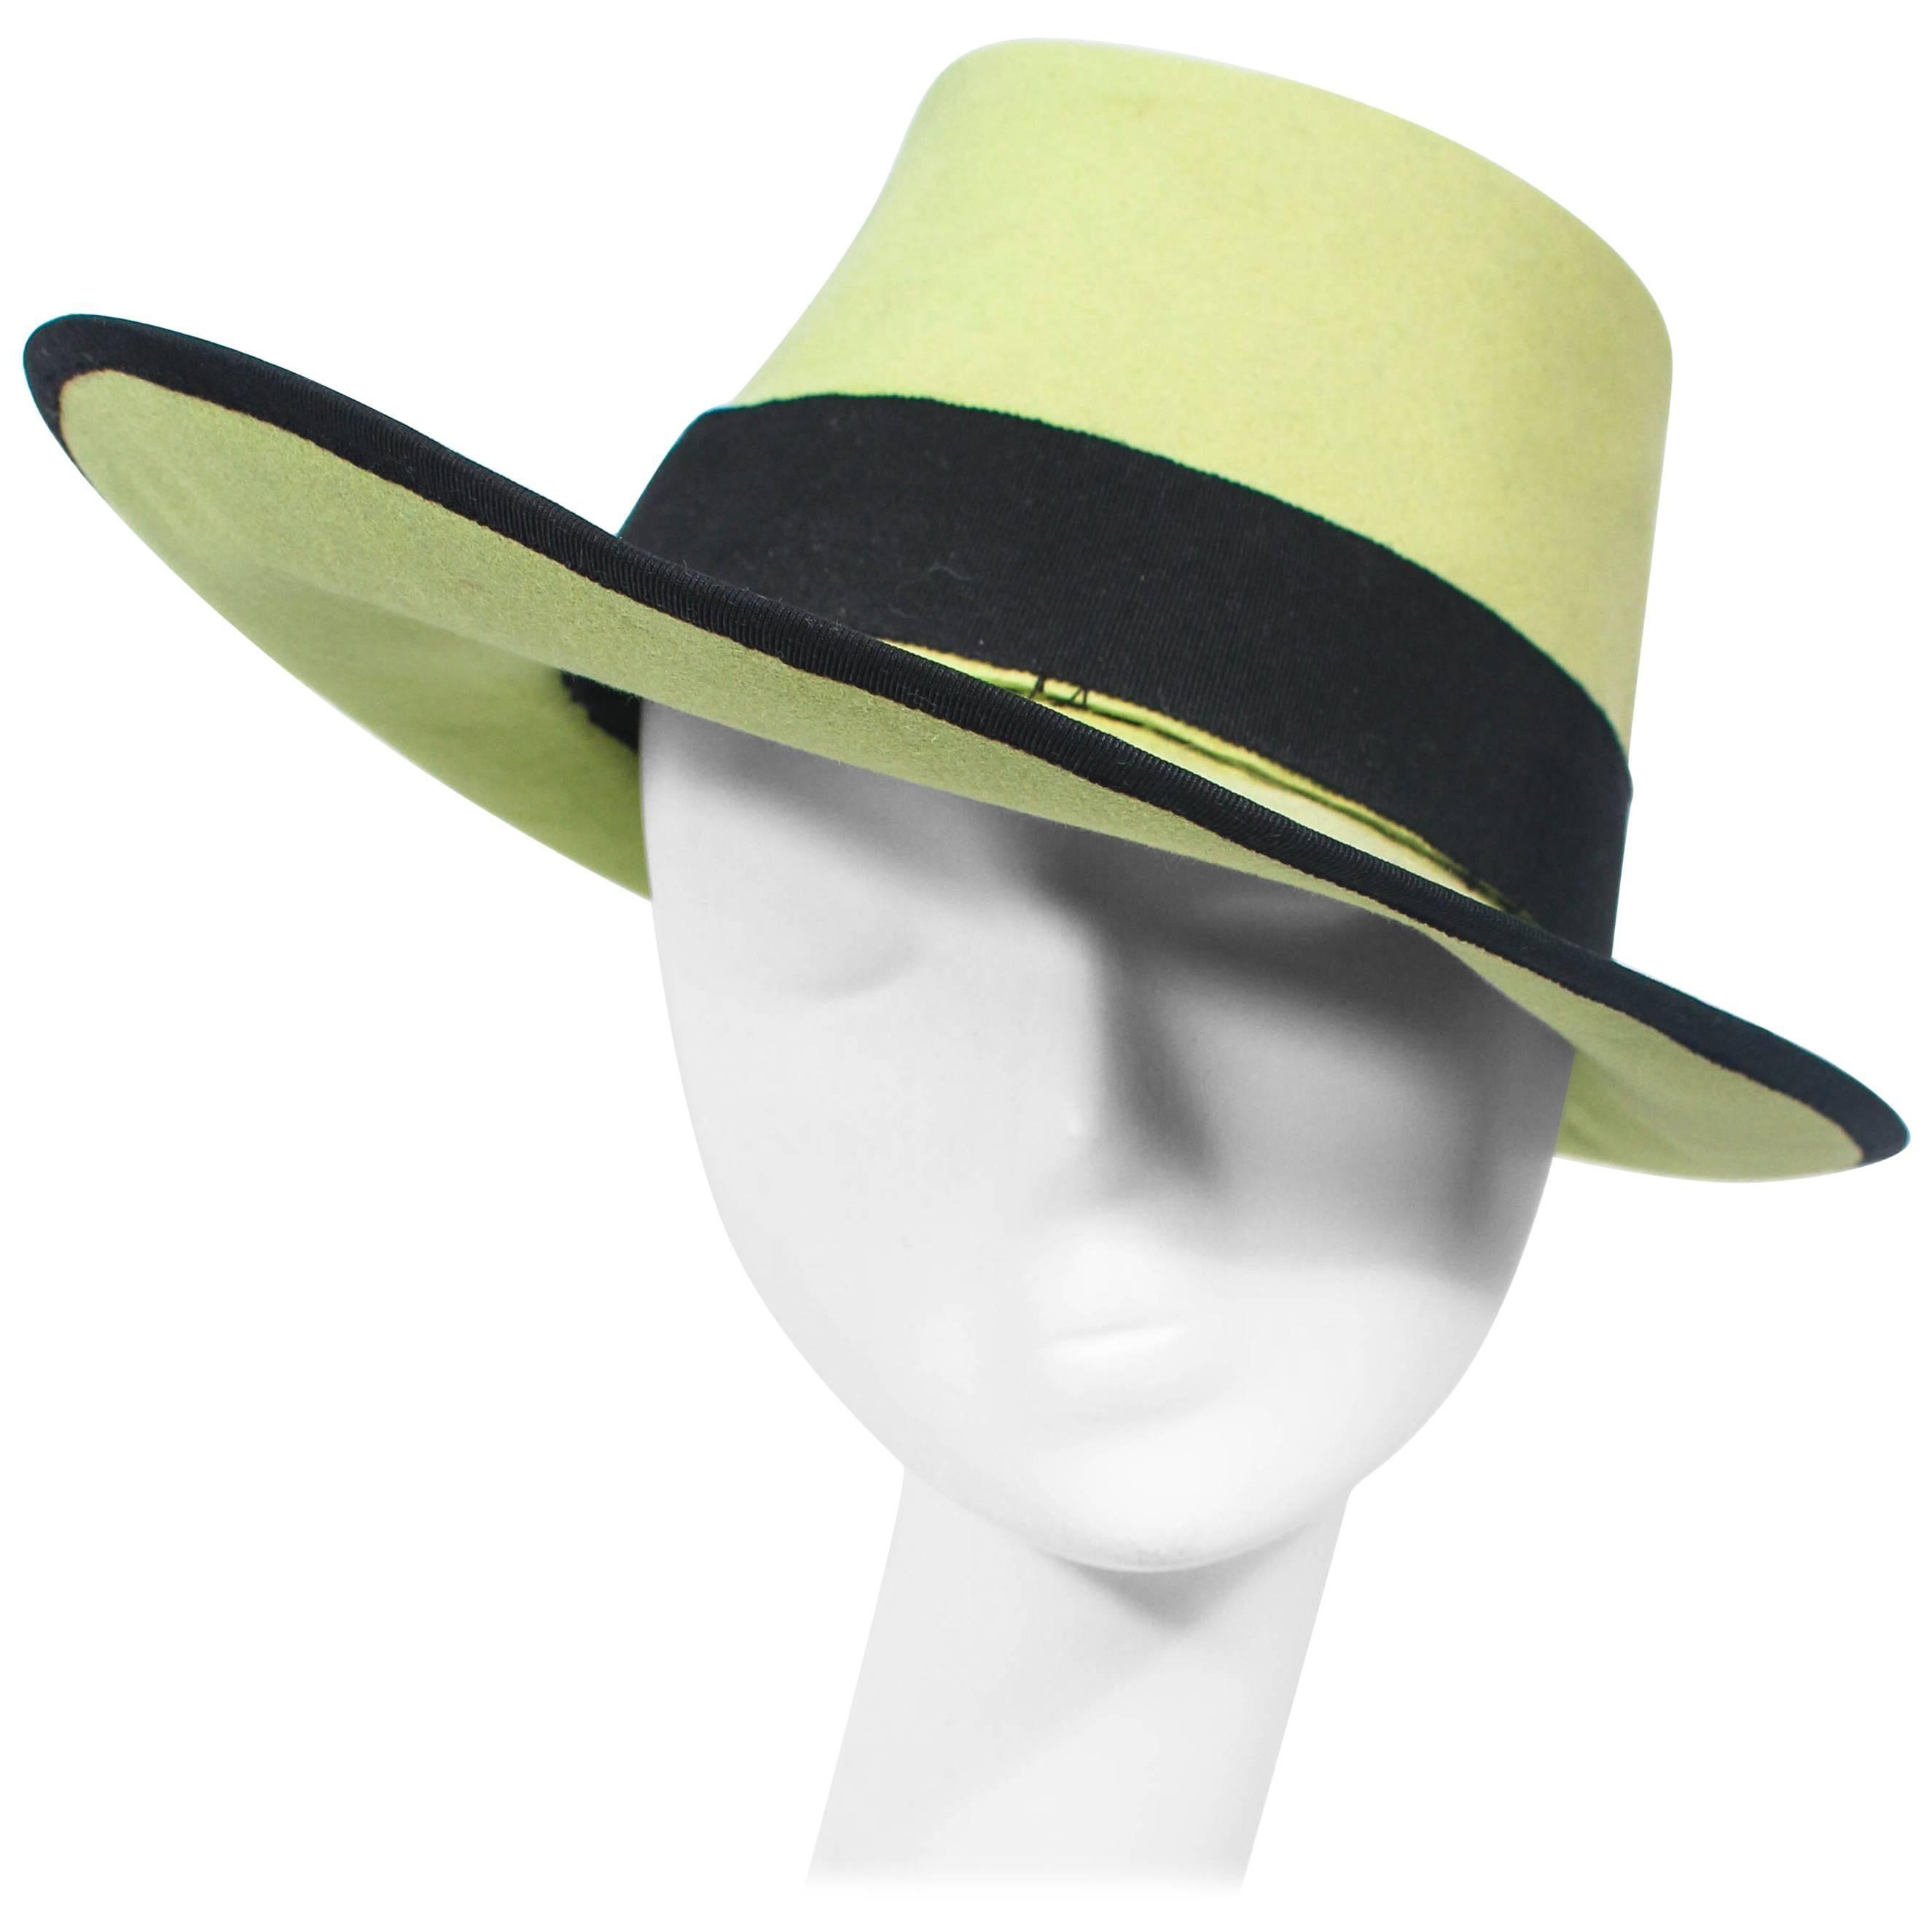 YVES SAINT LAURENT Rive Gauche Runway Abstract Green Top Hat